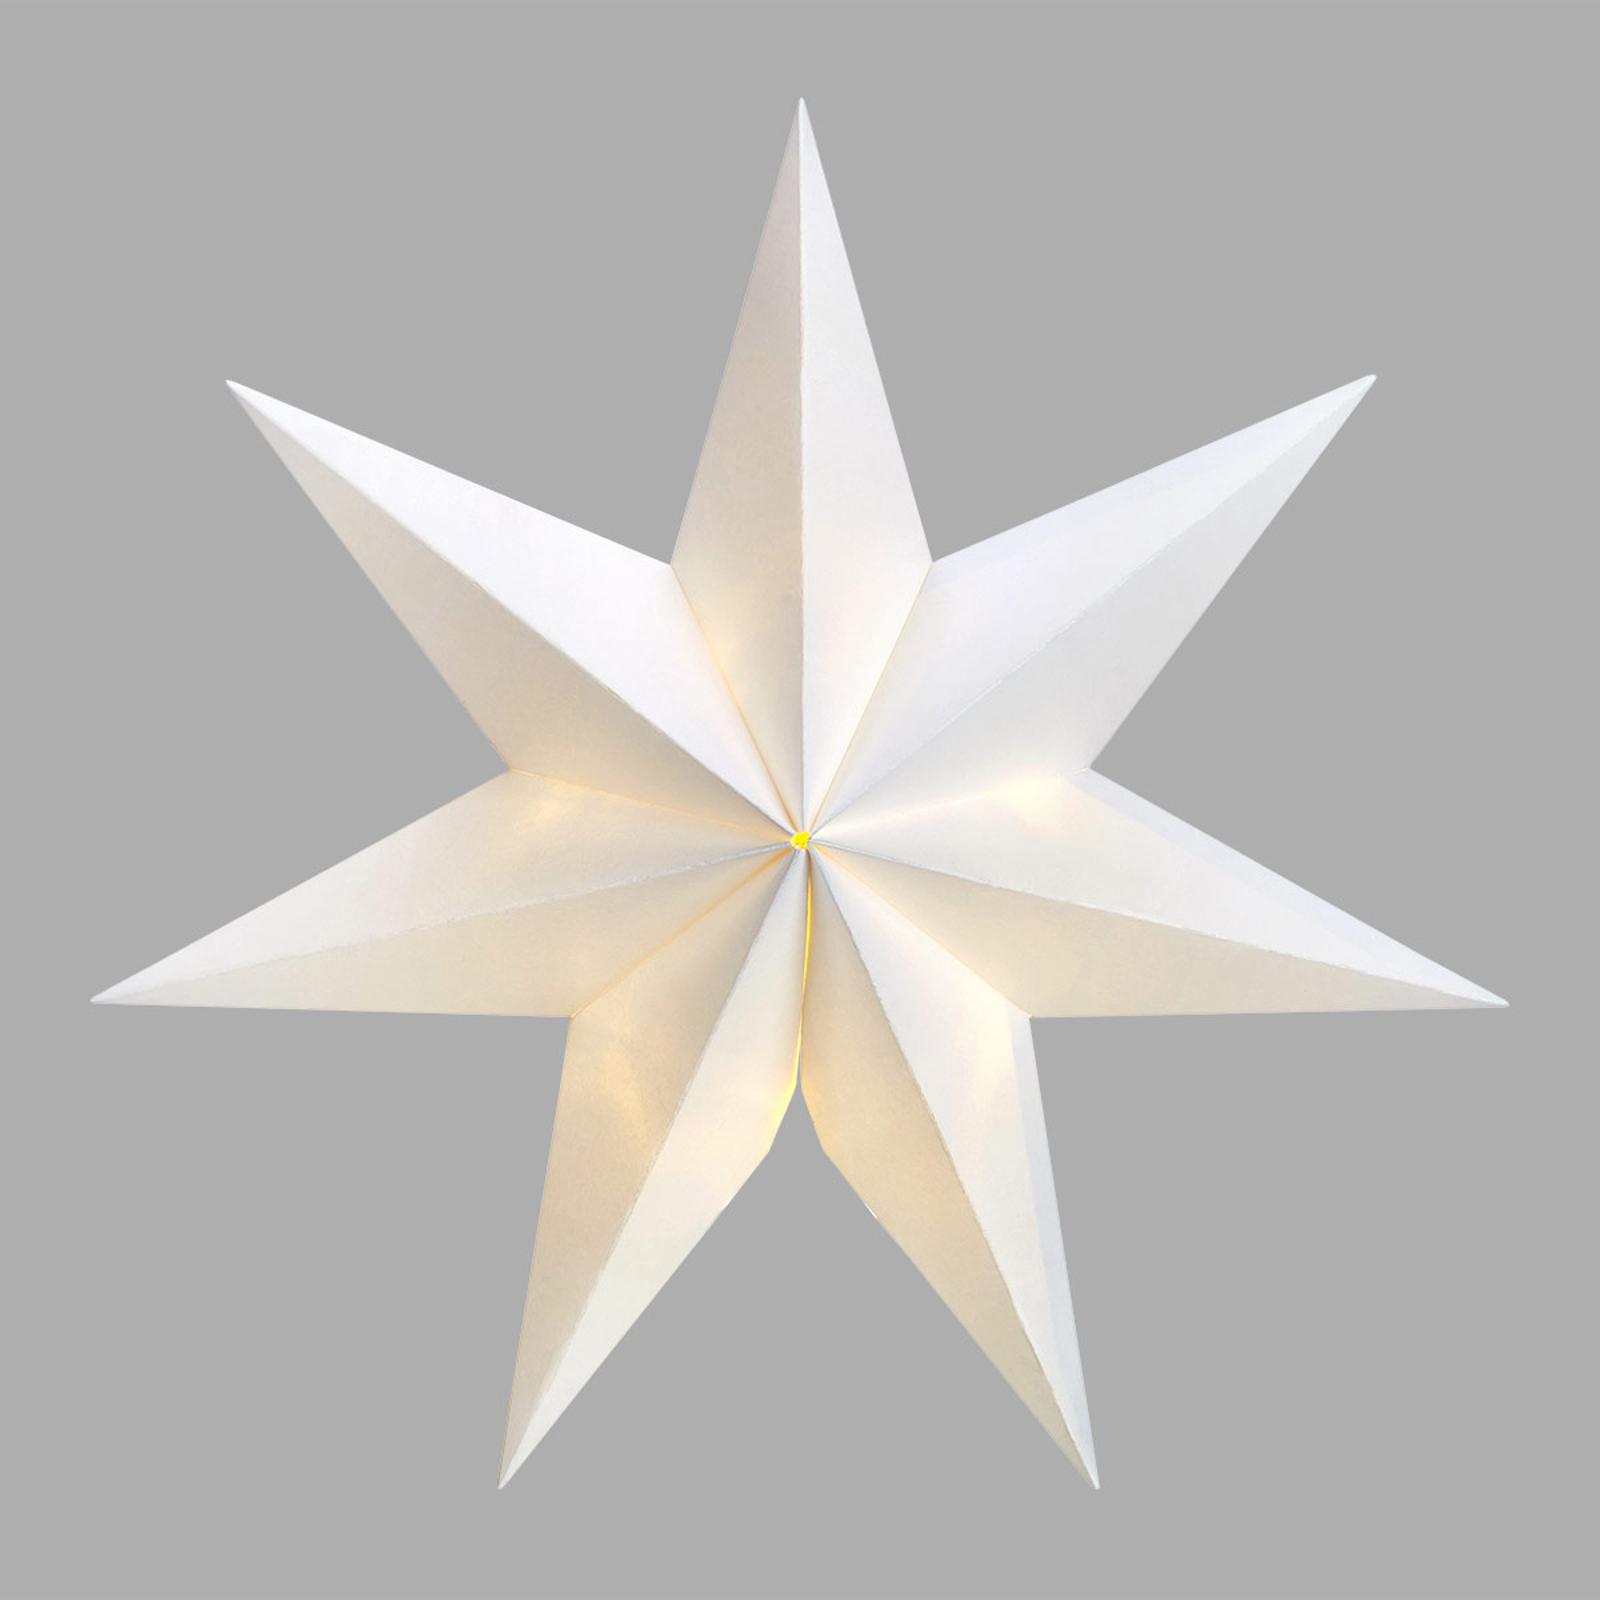 Siebenzackiger LED-Stern Malva m. Saugnapf-Halter